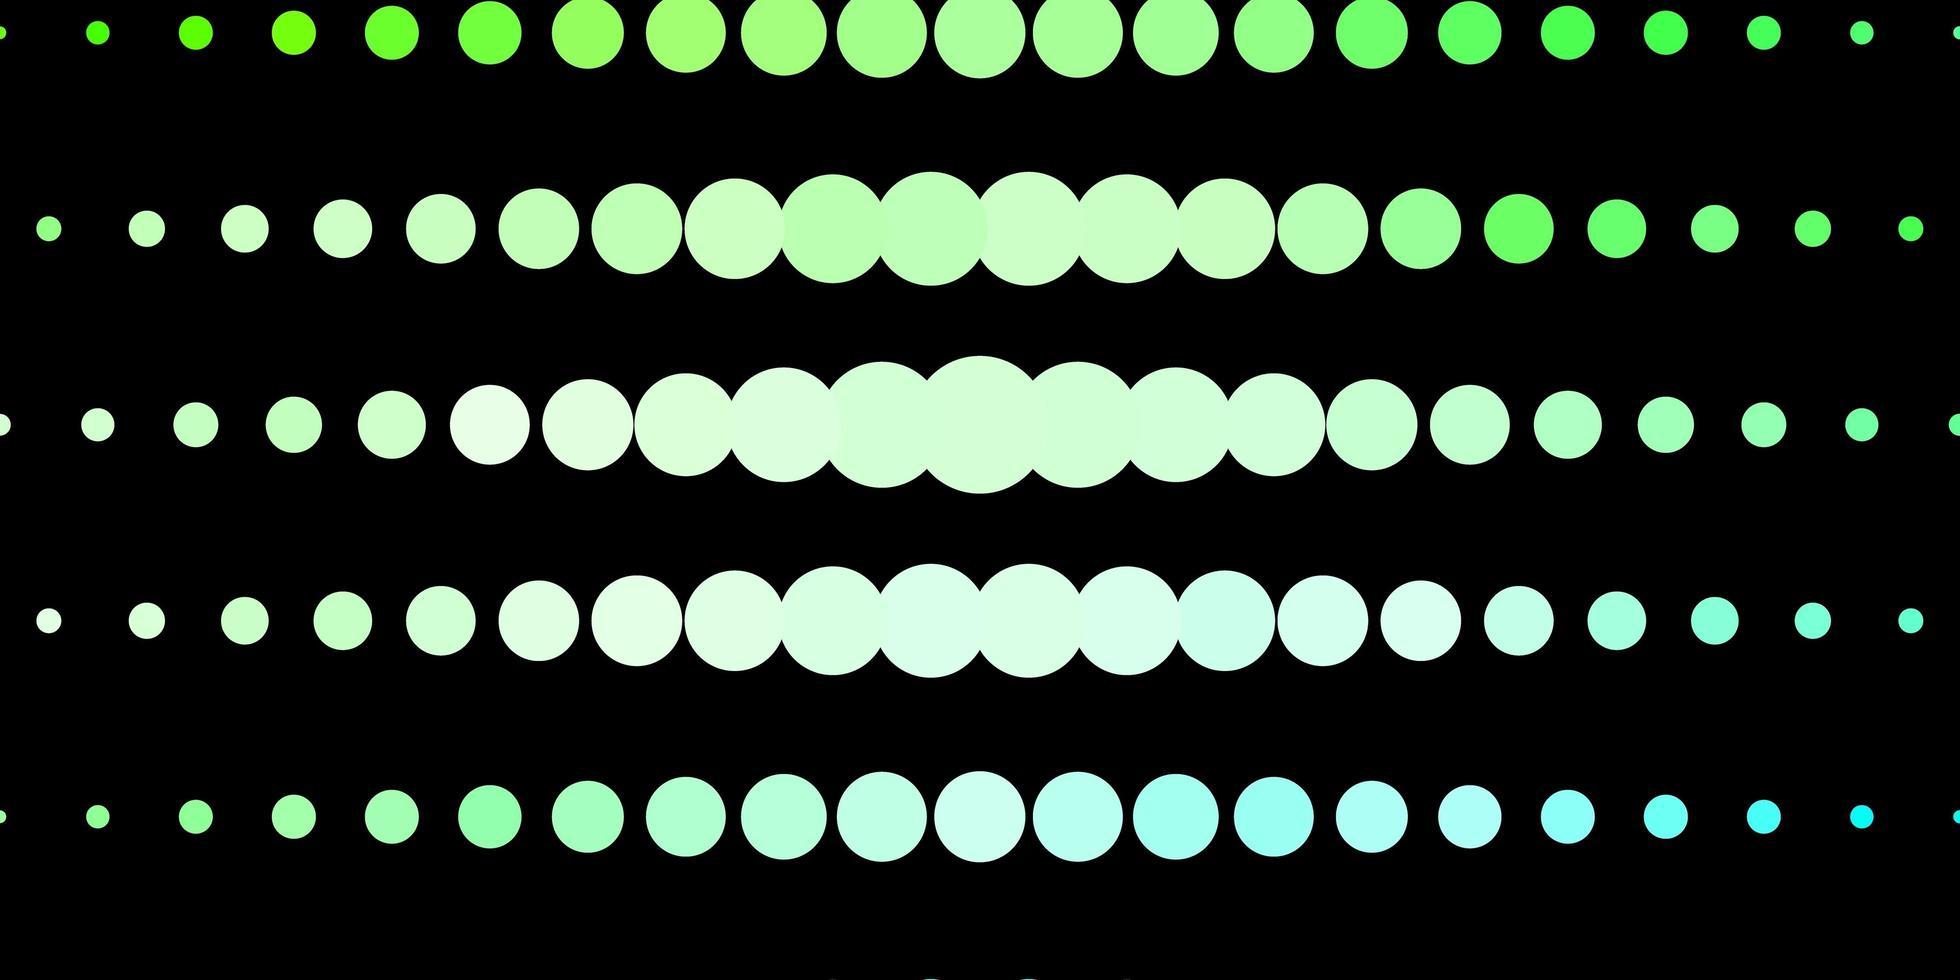 dunkelgrüne Vorlage mit Kreisen. vektor